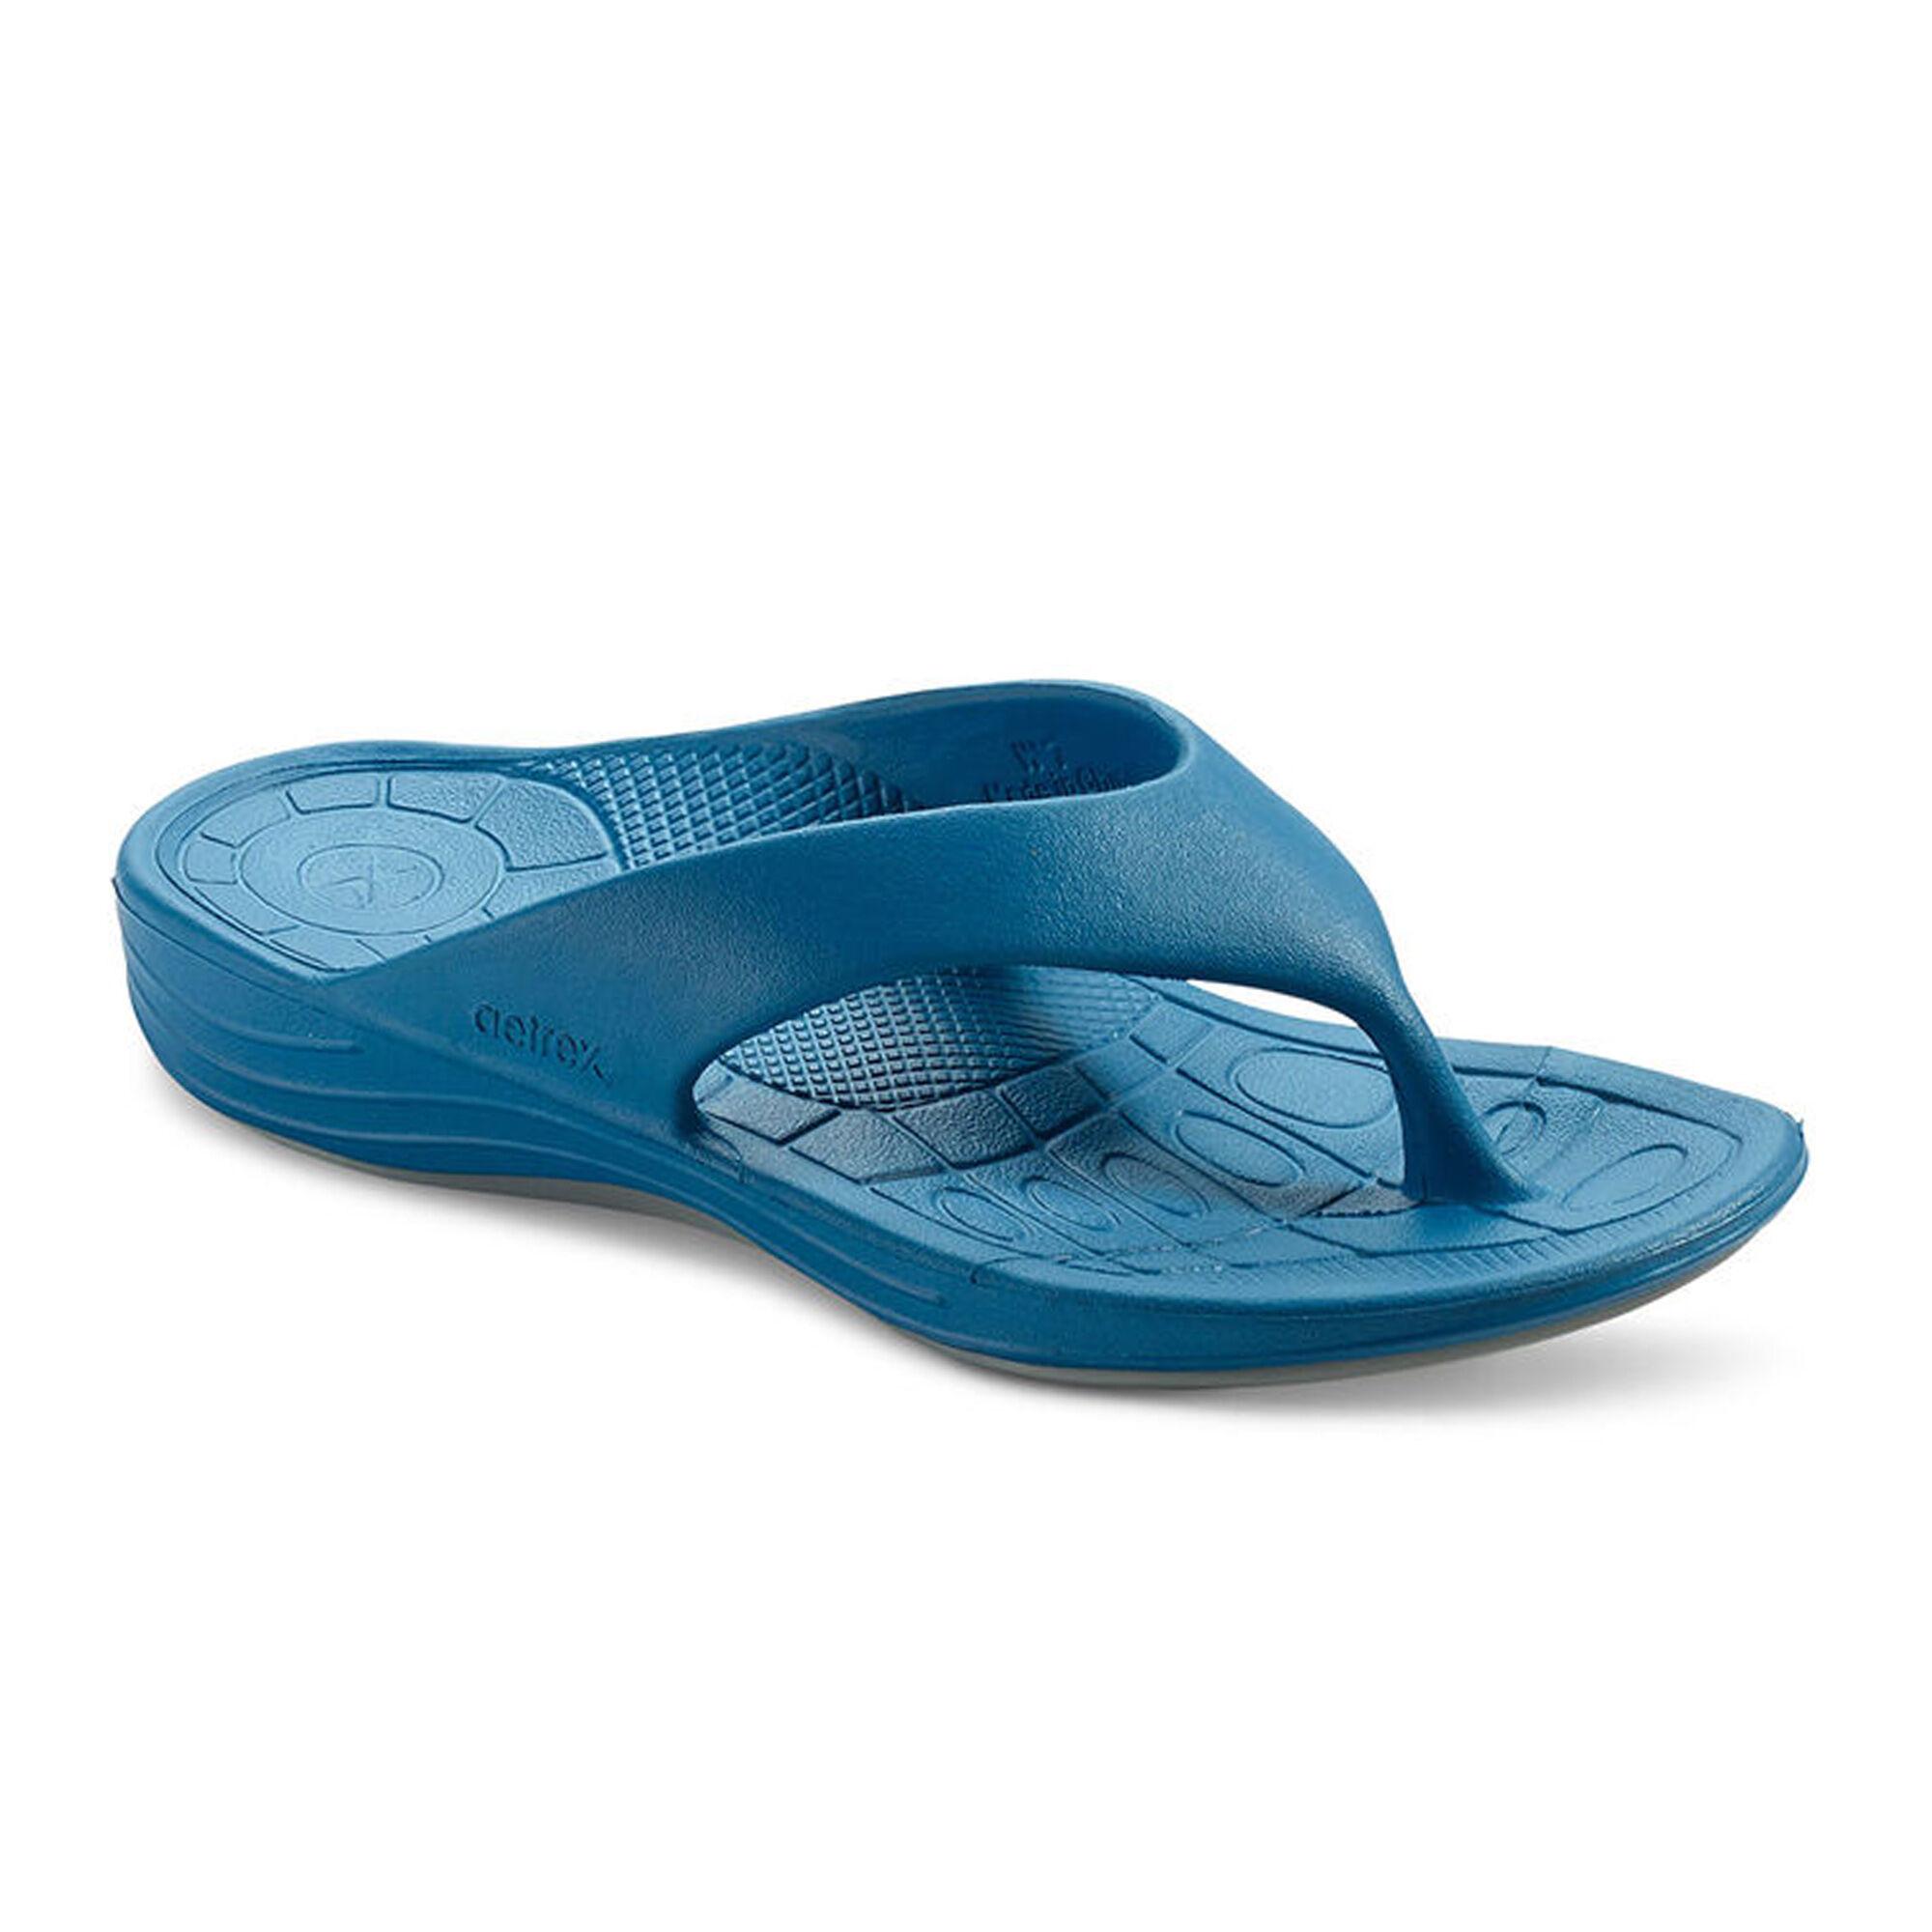 Aetrex Women/'s Lynco Flip Sandal Blue L3600W Brand New with Tags